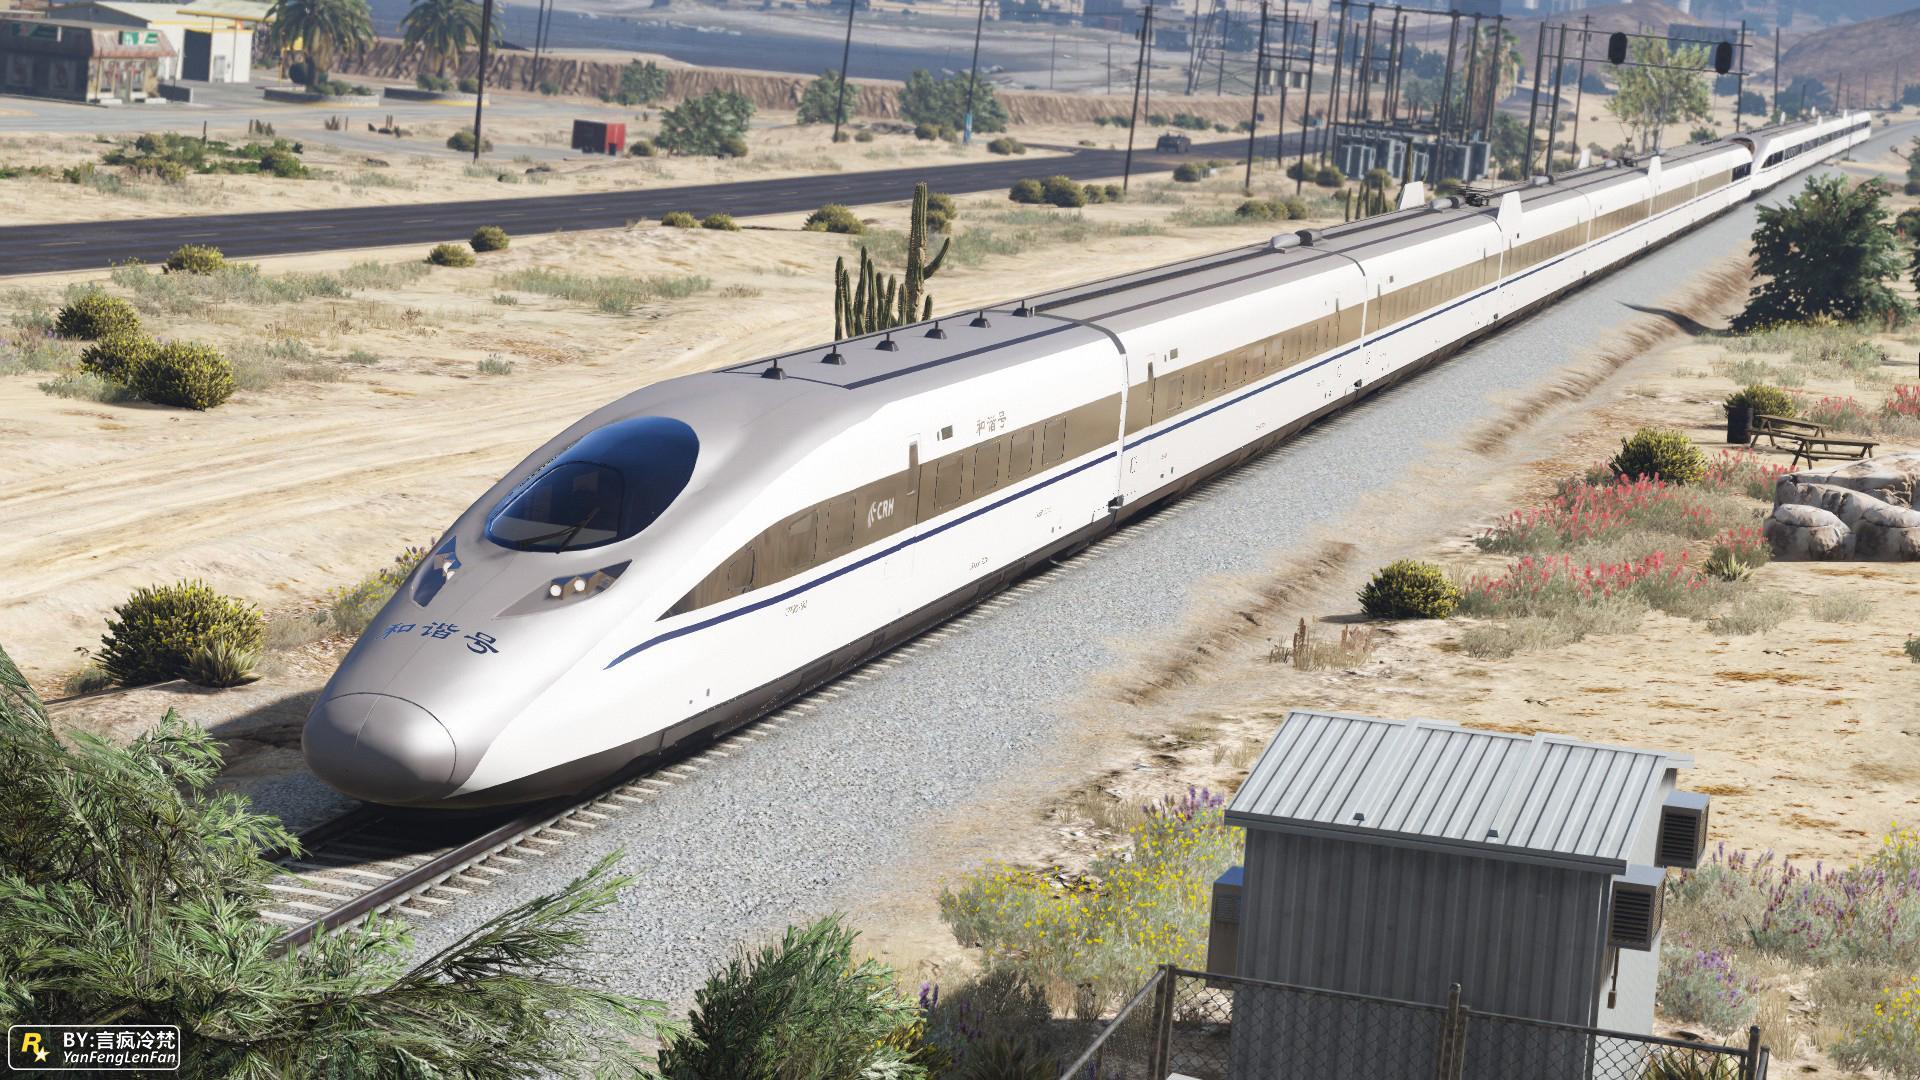 China Railways High Speed Train Crh380a Emu 和谐号crh380a